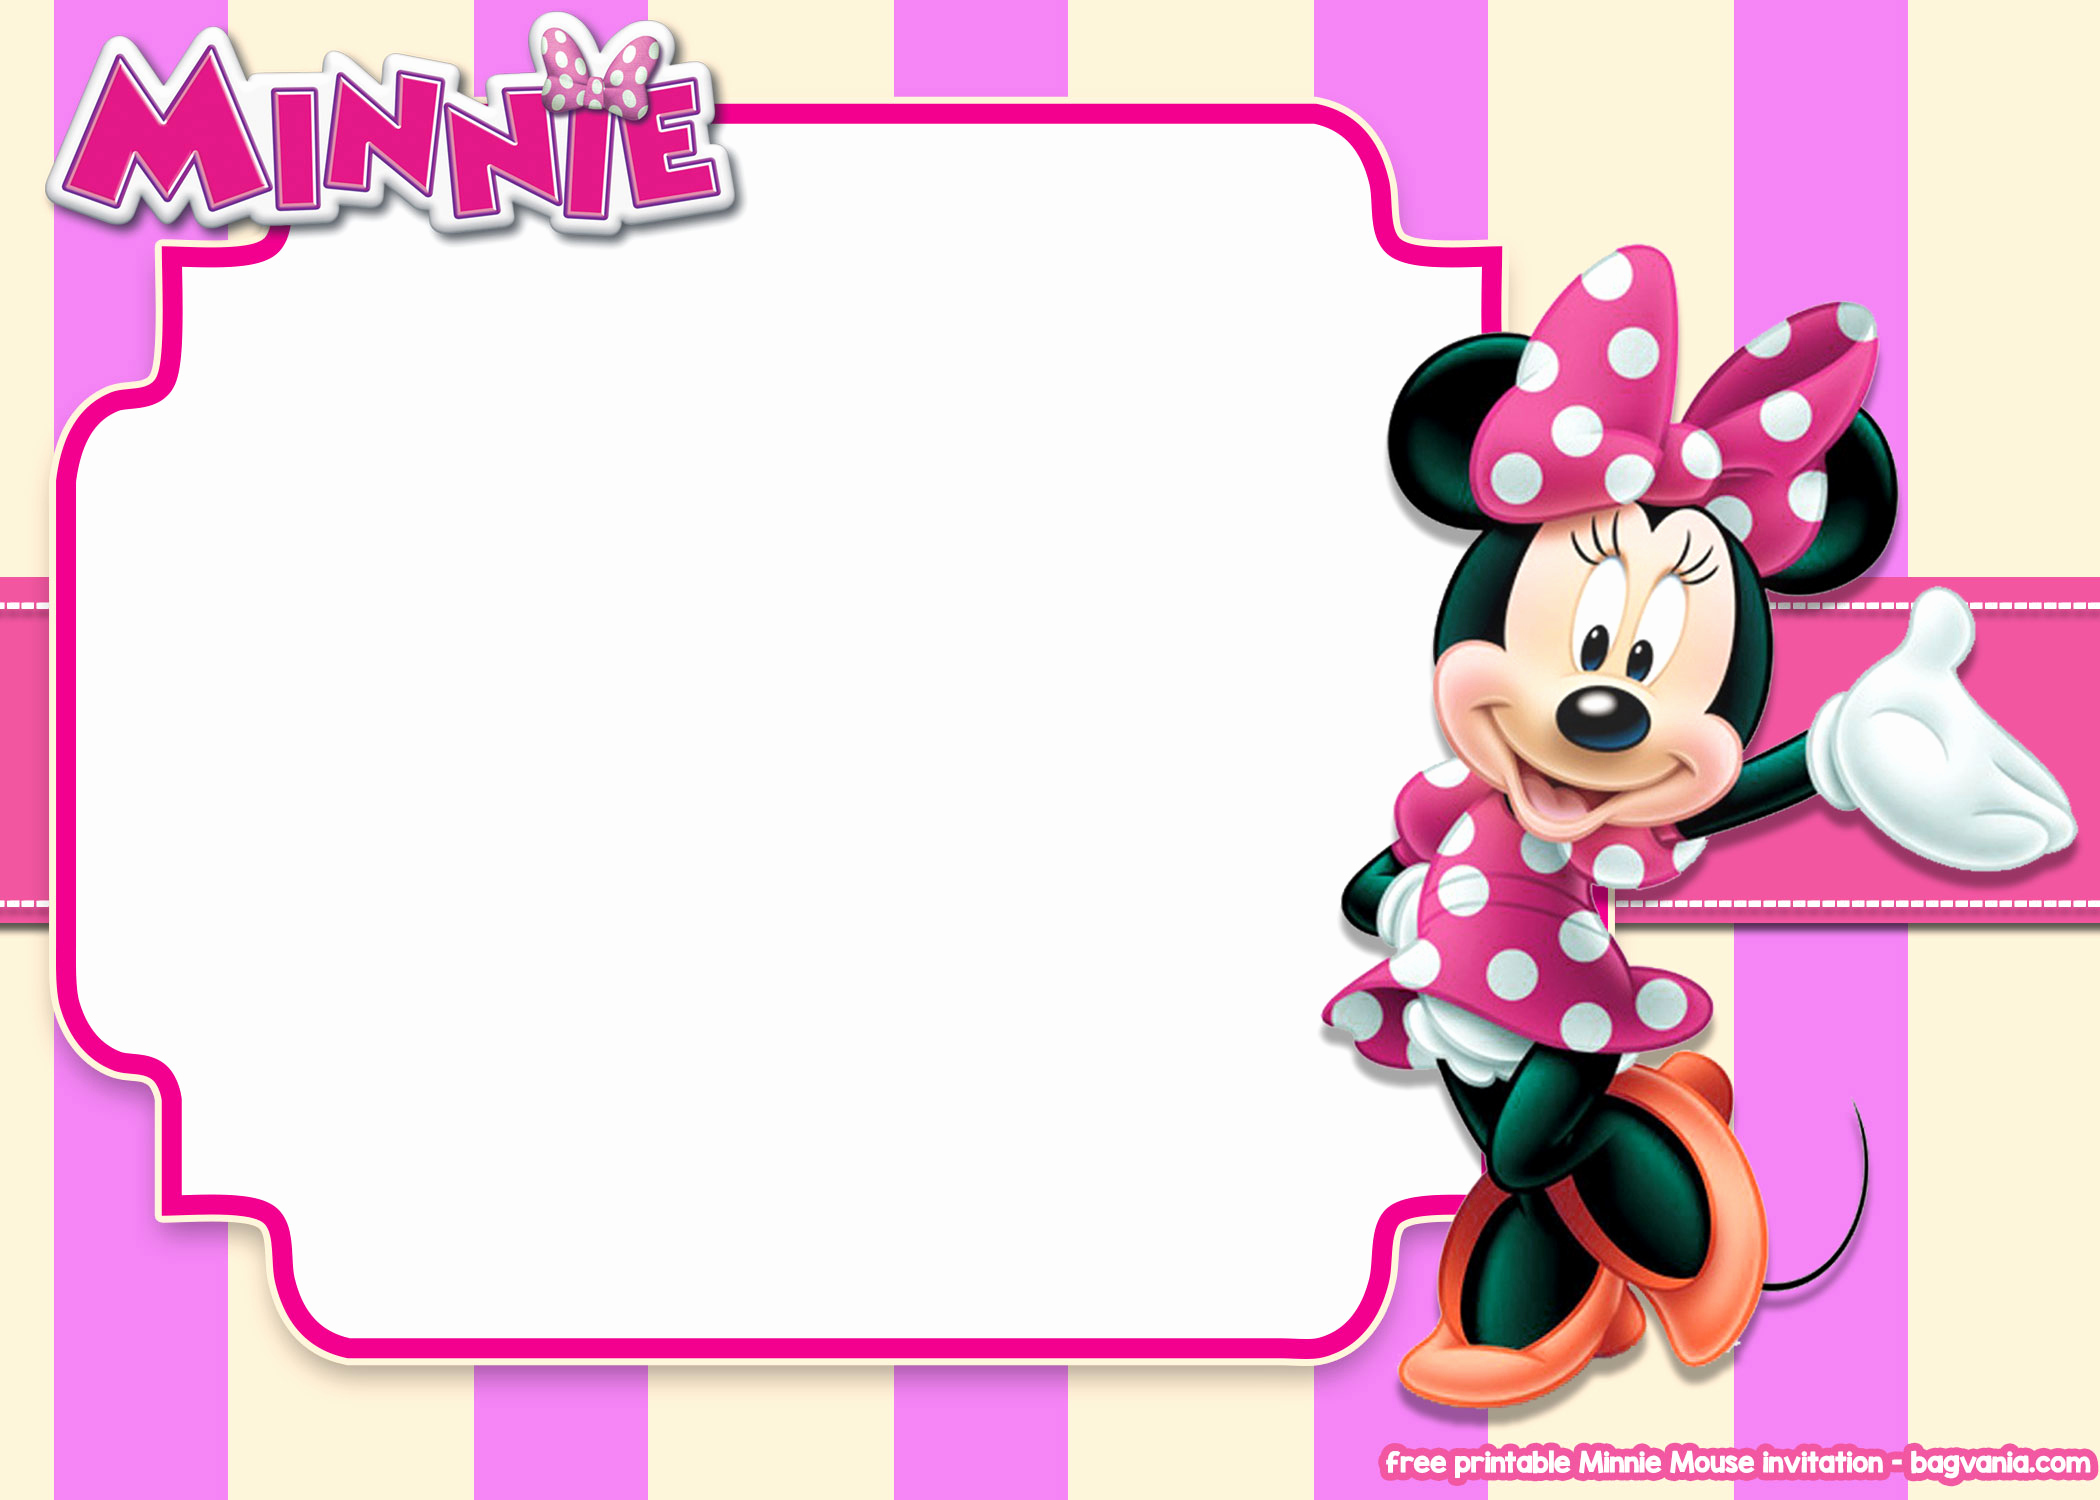 Minnie Mouse Invitation Template Online Unique Free Printable Minnie Mouse Pink Invitation Templates